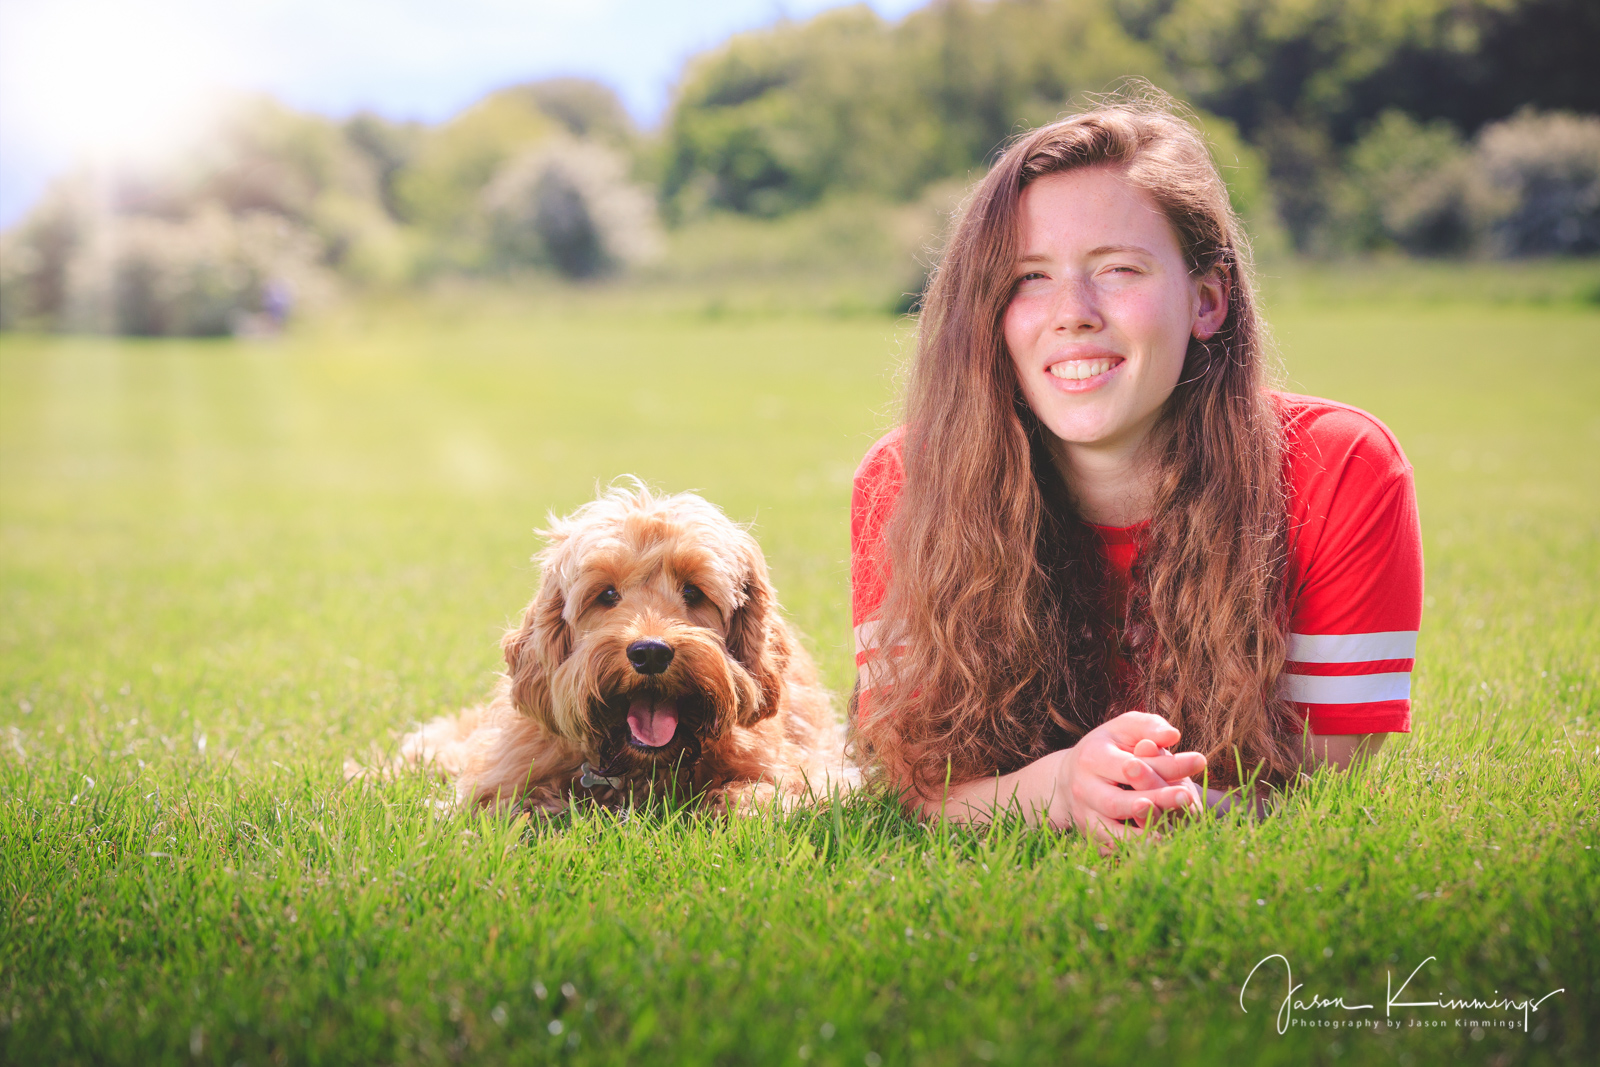 Dog-pet-photography-edinburgh-glasgow-west-lothian-7.jpg